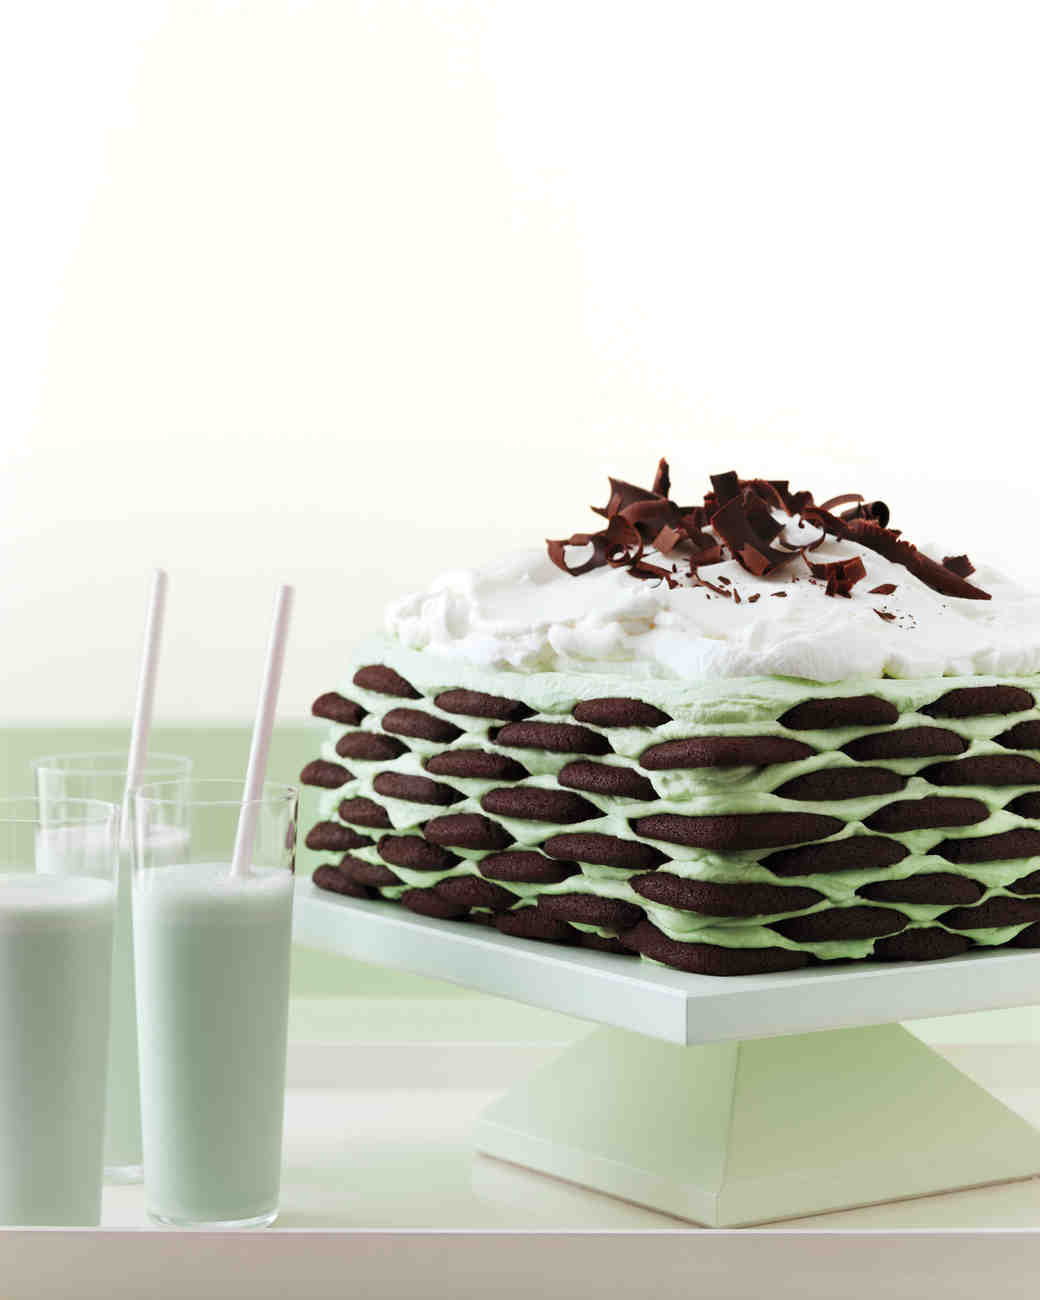 cakes-grasshopper-heaven-mwd108165.jpg